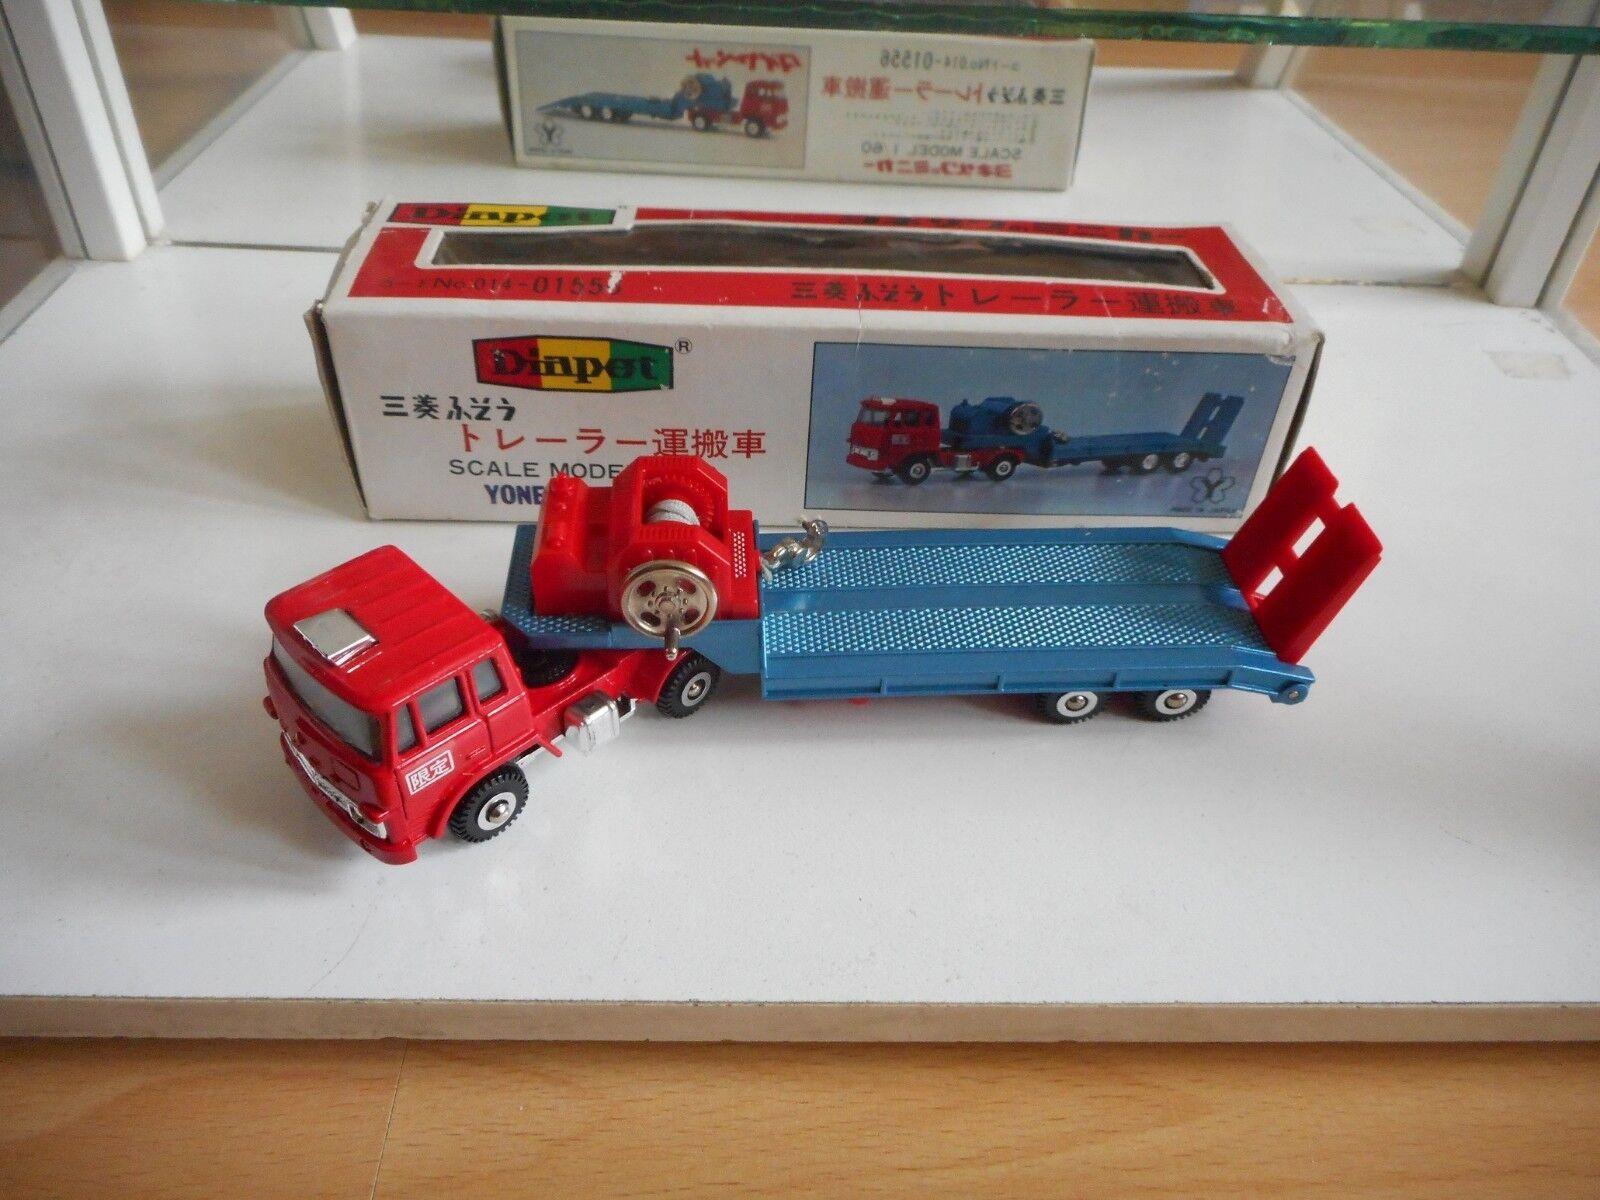 Yonezawa Toys Diapet Mitsibishi Fuso + Construction Trailer in Red - 1 60 in Box